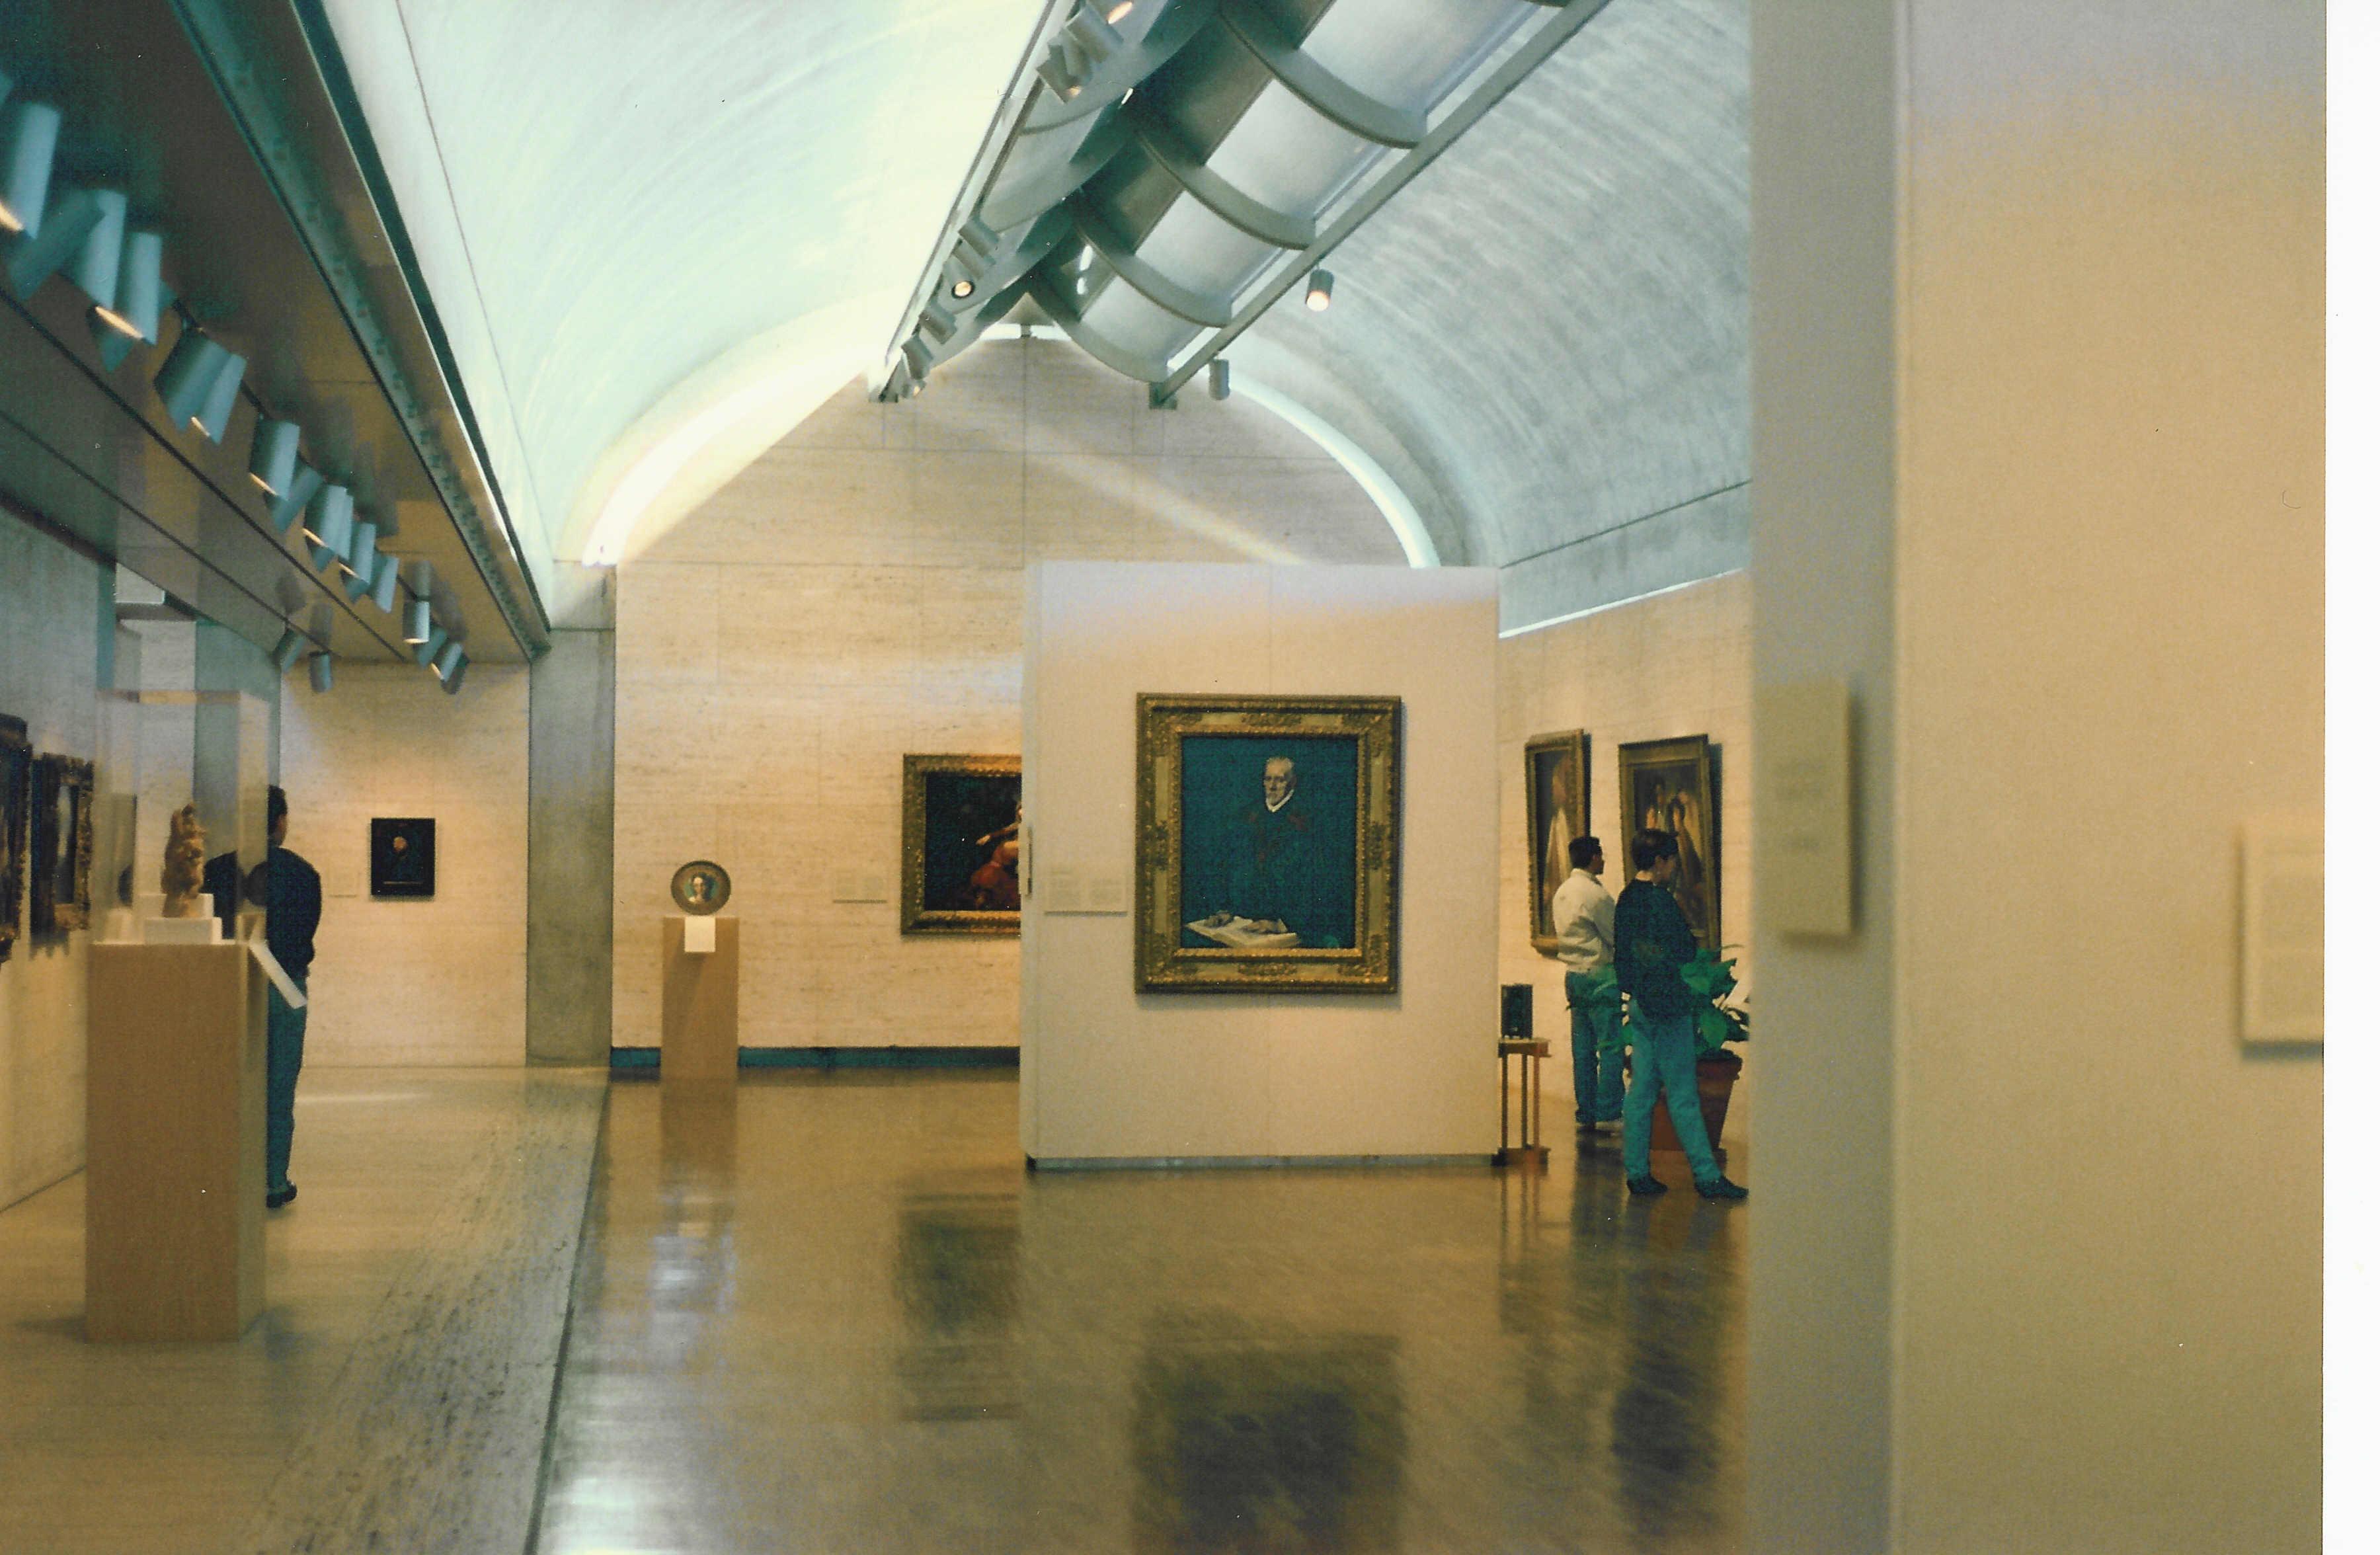 پروژه پاورپوینت موزه فورث ورث